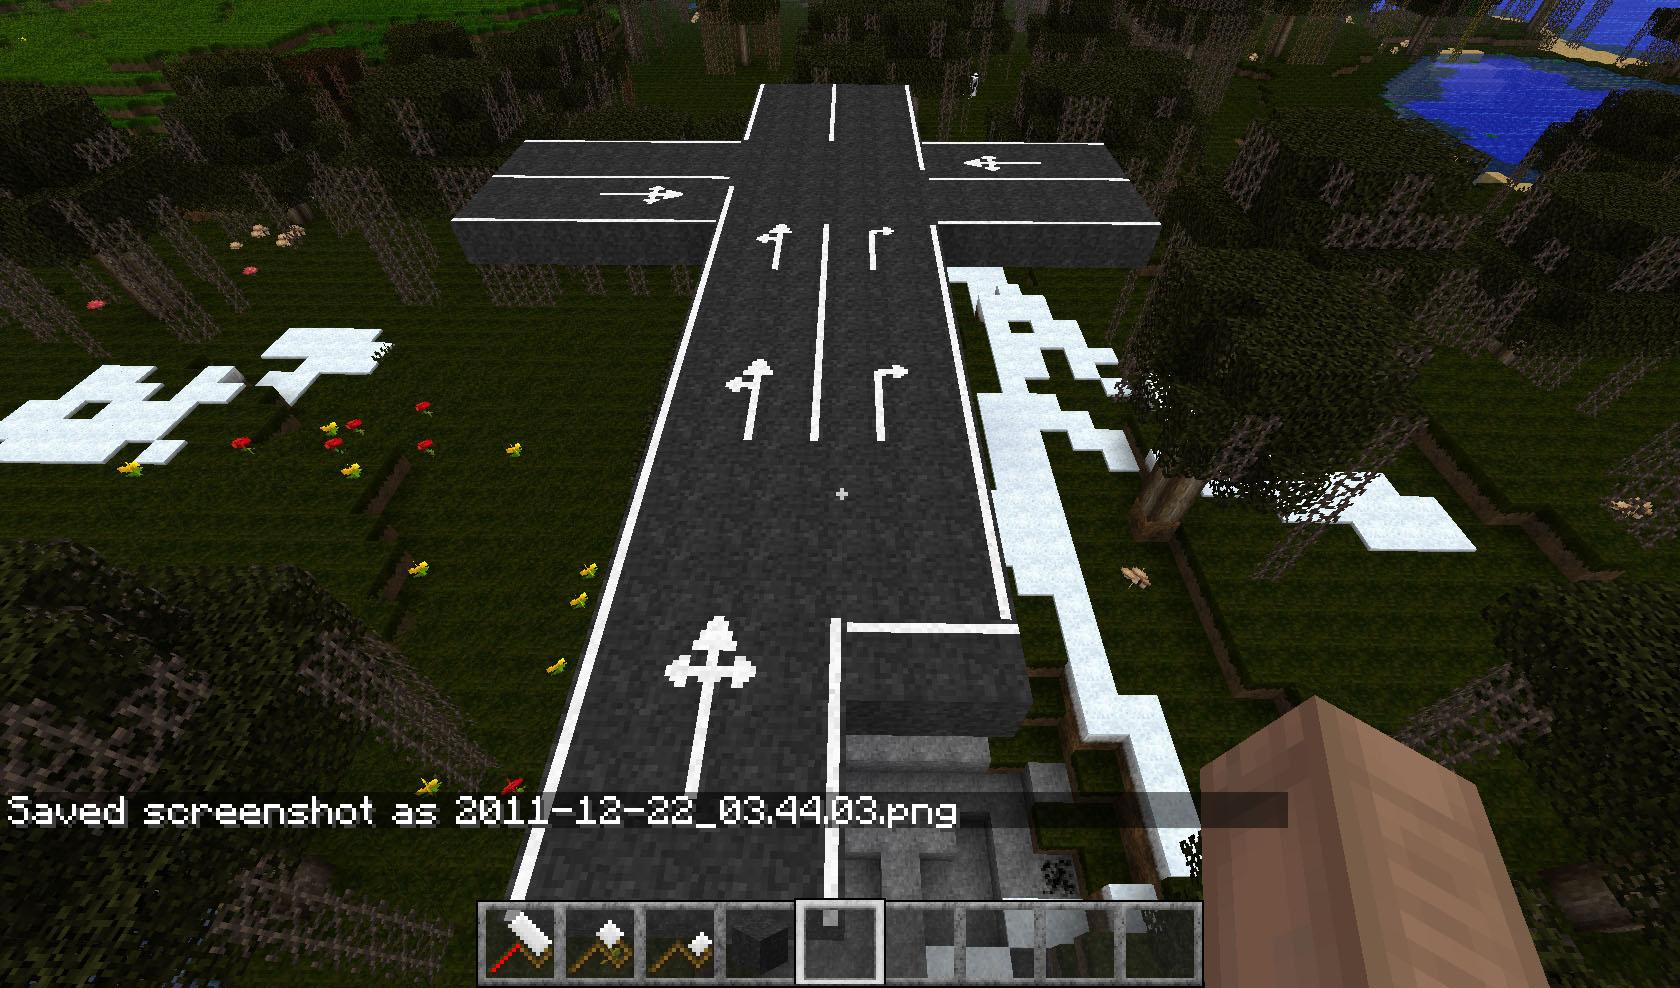 https://i2.wp.com/cdn.9pety.com/imgs/Mods/RoadWorks-Mod-2.jpg?ssl=1